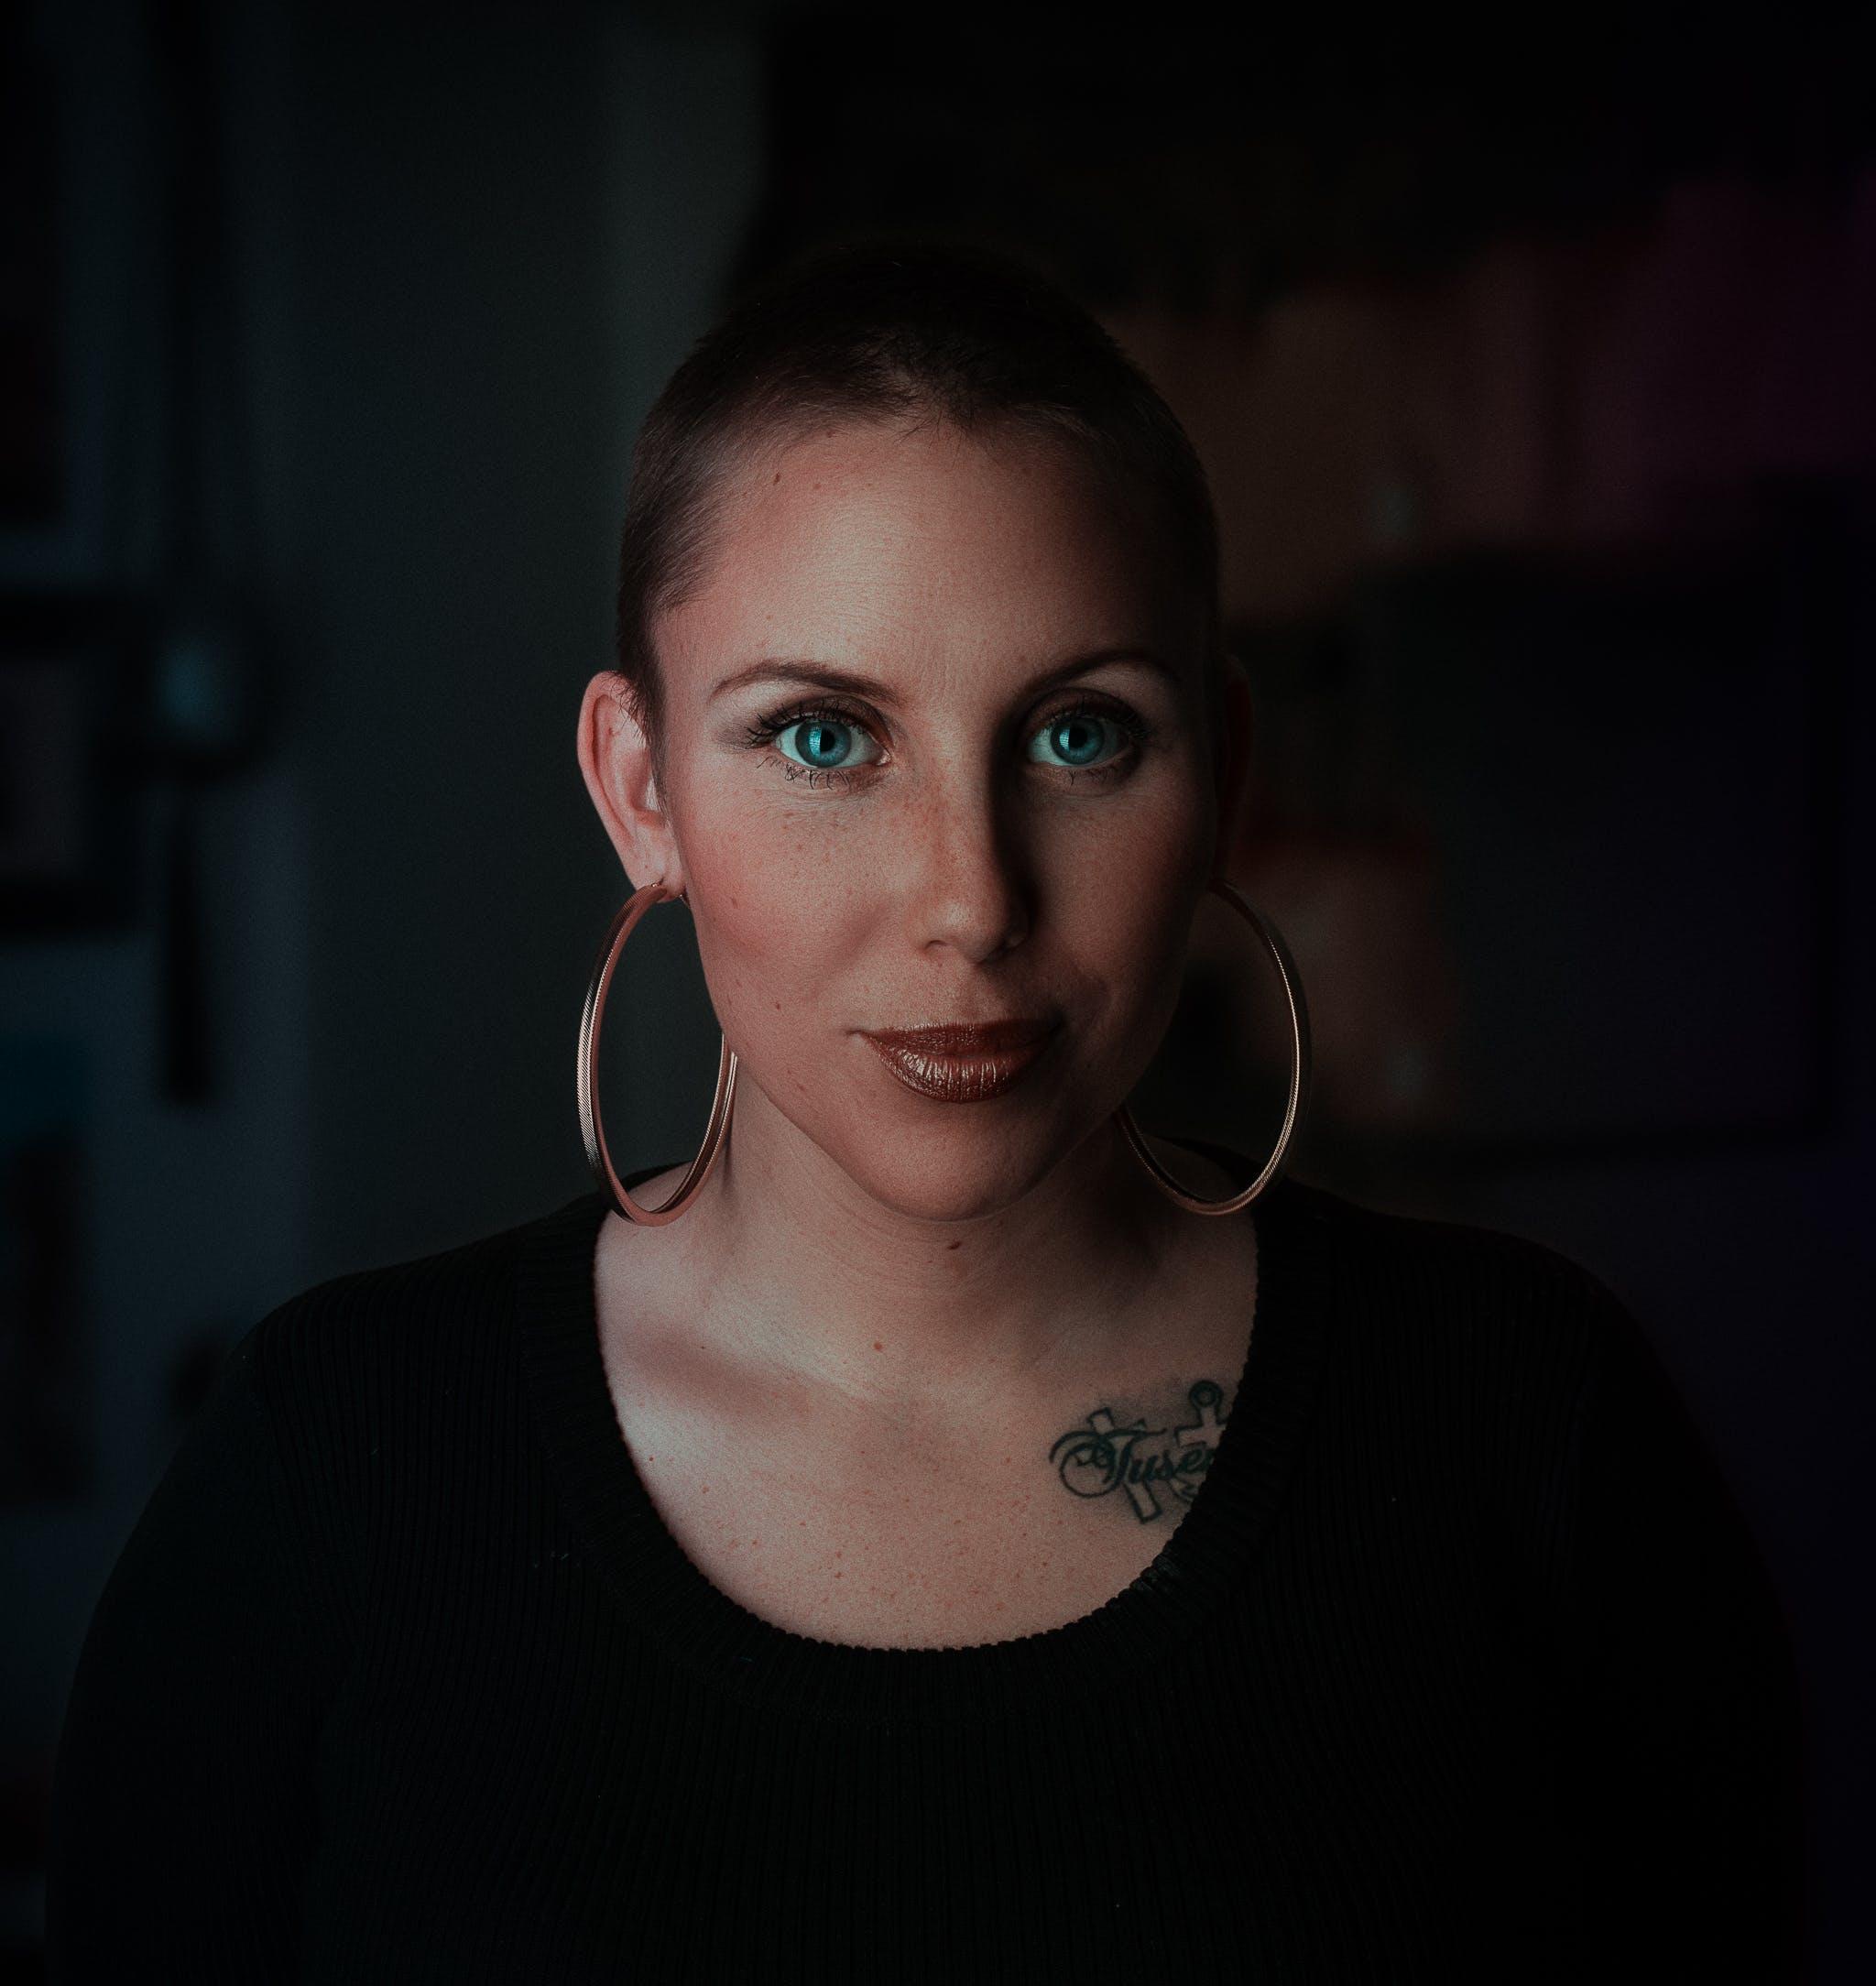 Woman Wearing Earrings and Black Shirt